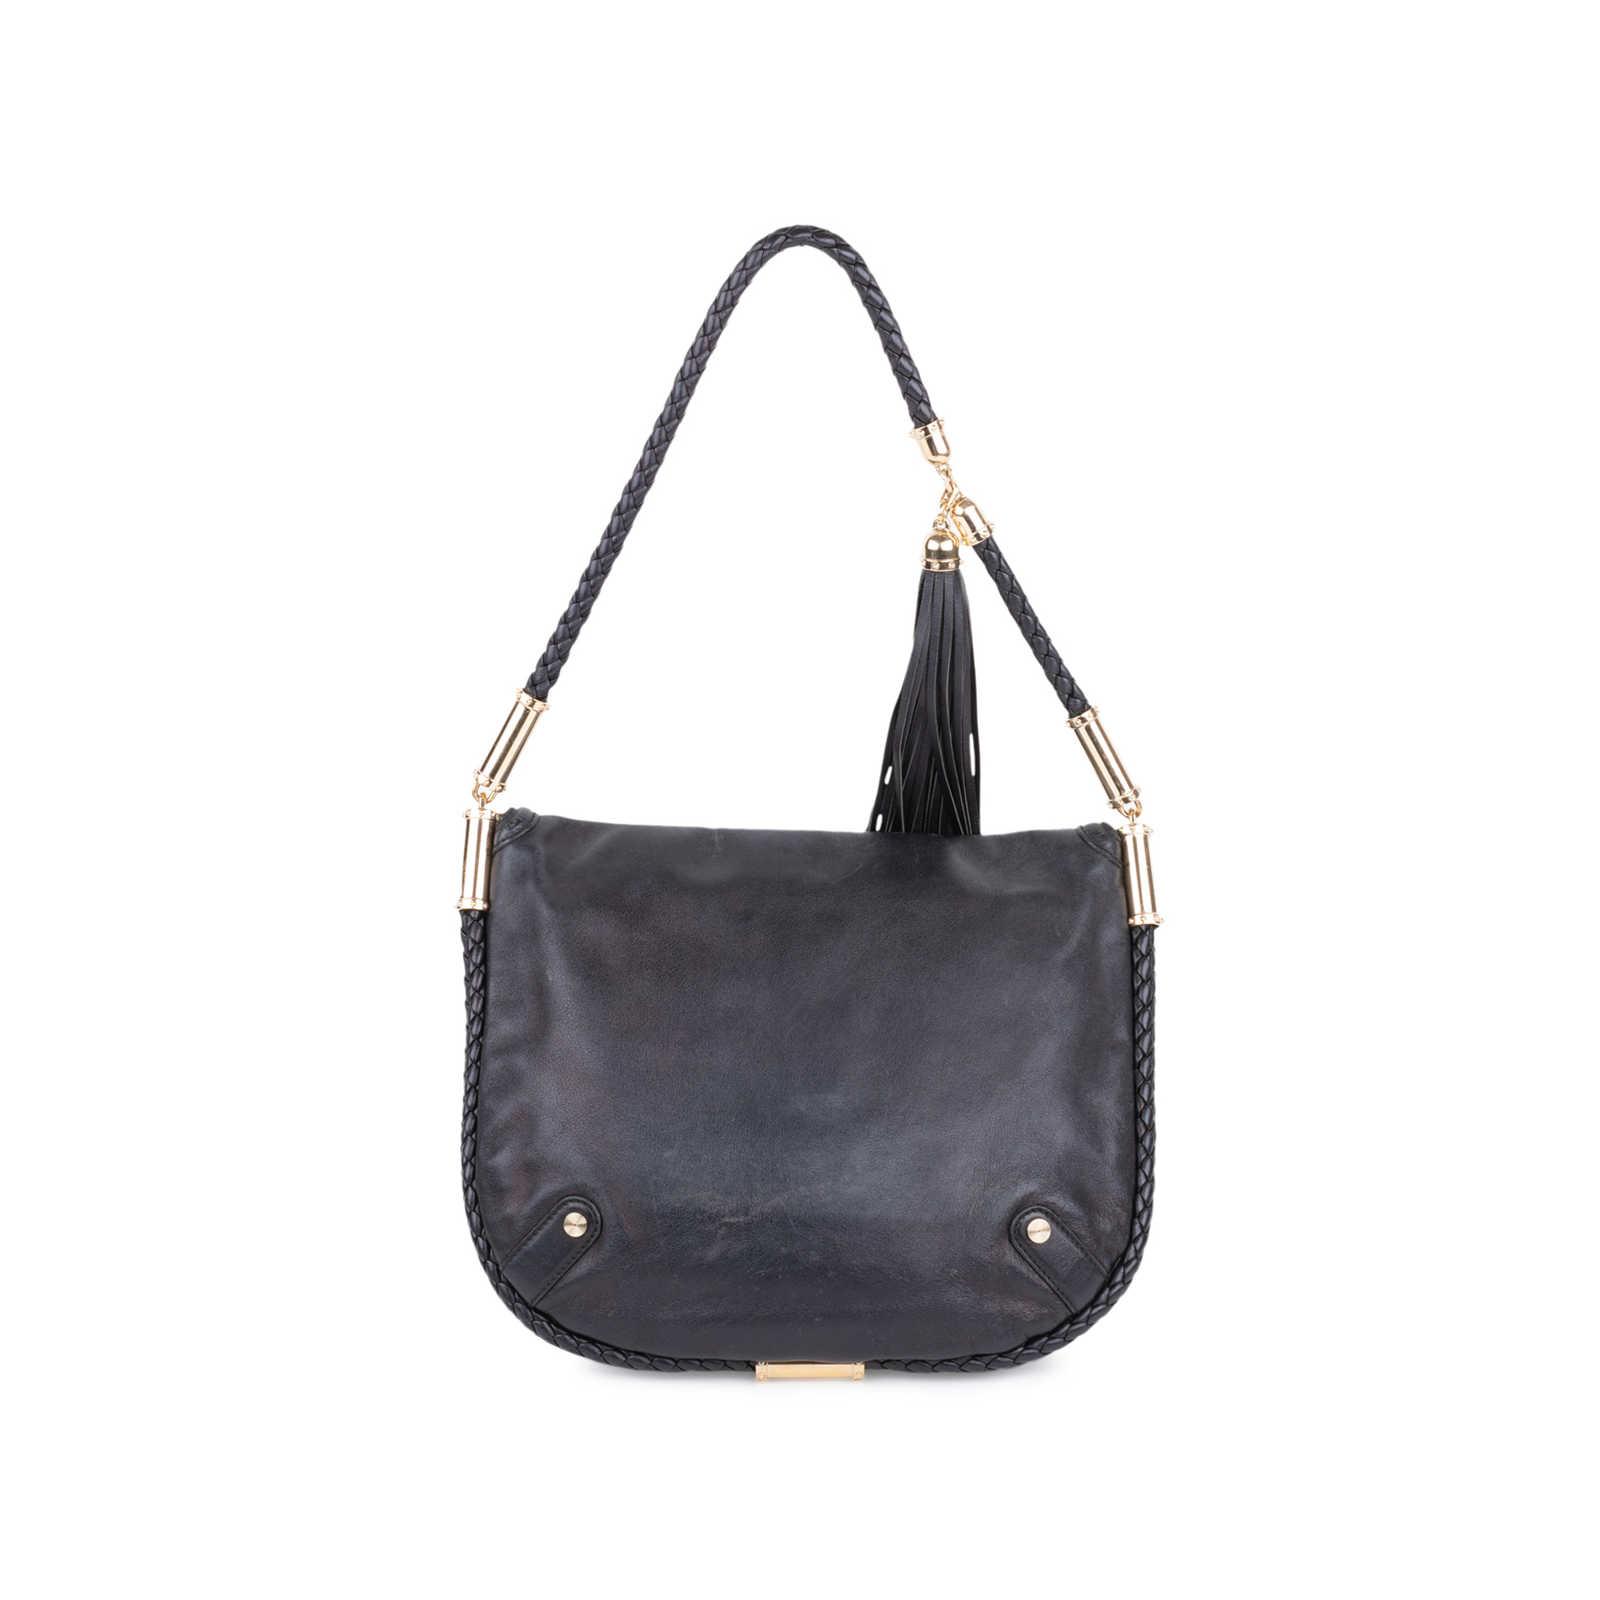 77c3a119dbf ... Authentic Second Hand Gucci Britt Tassel Bag (PSS-597-00001) - Thumbnail  ...